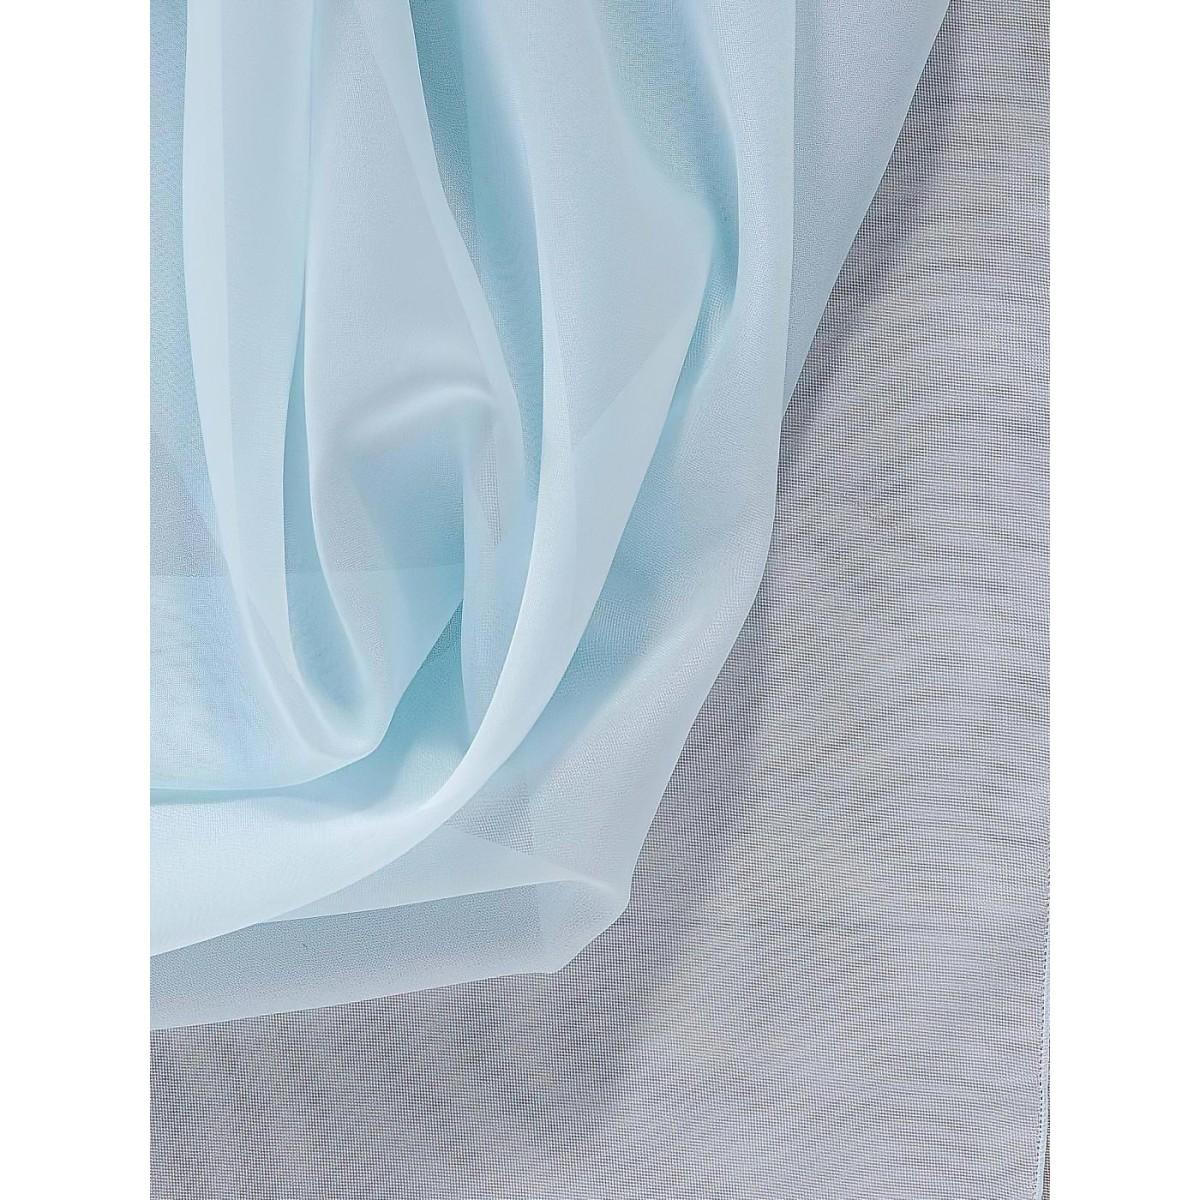 Тюль Томдом Перол Td-123580 290Х300